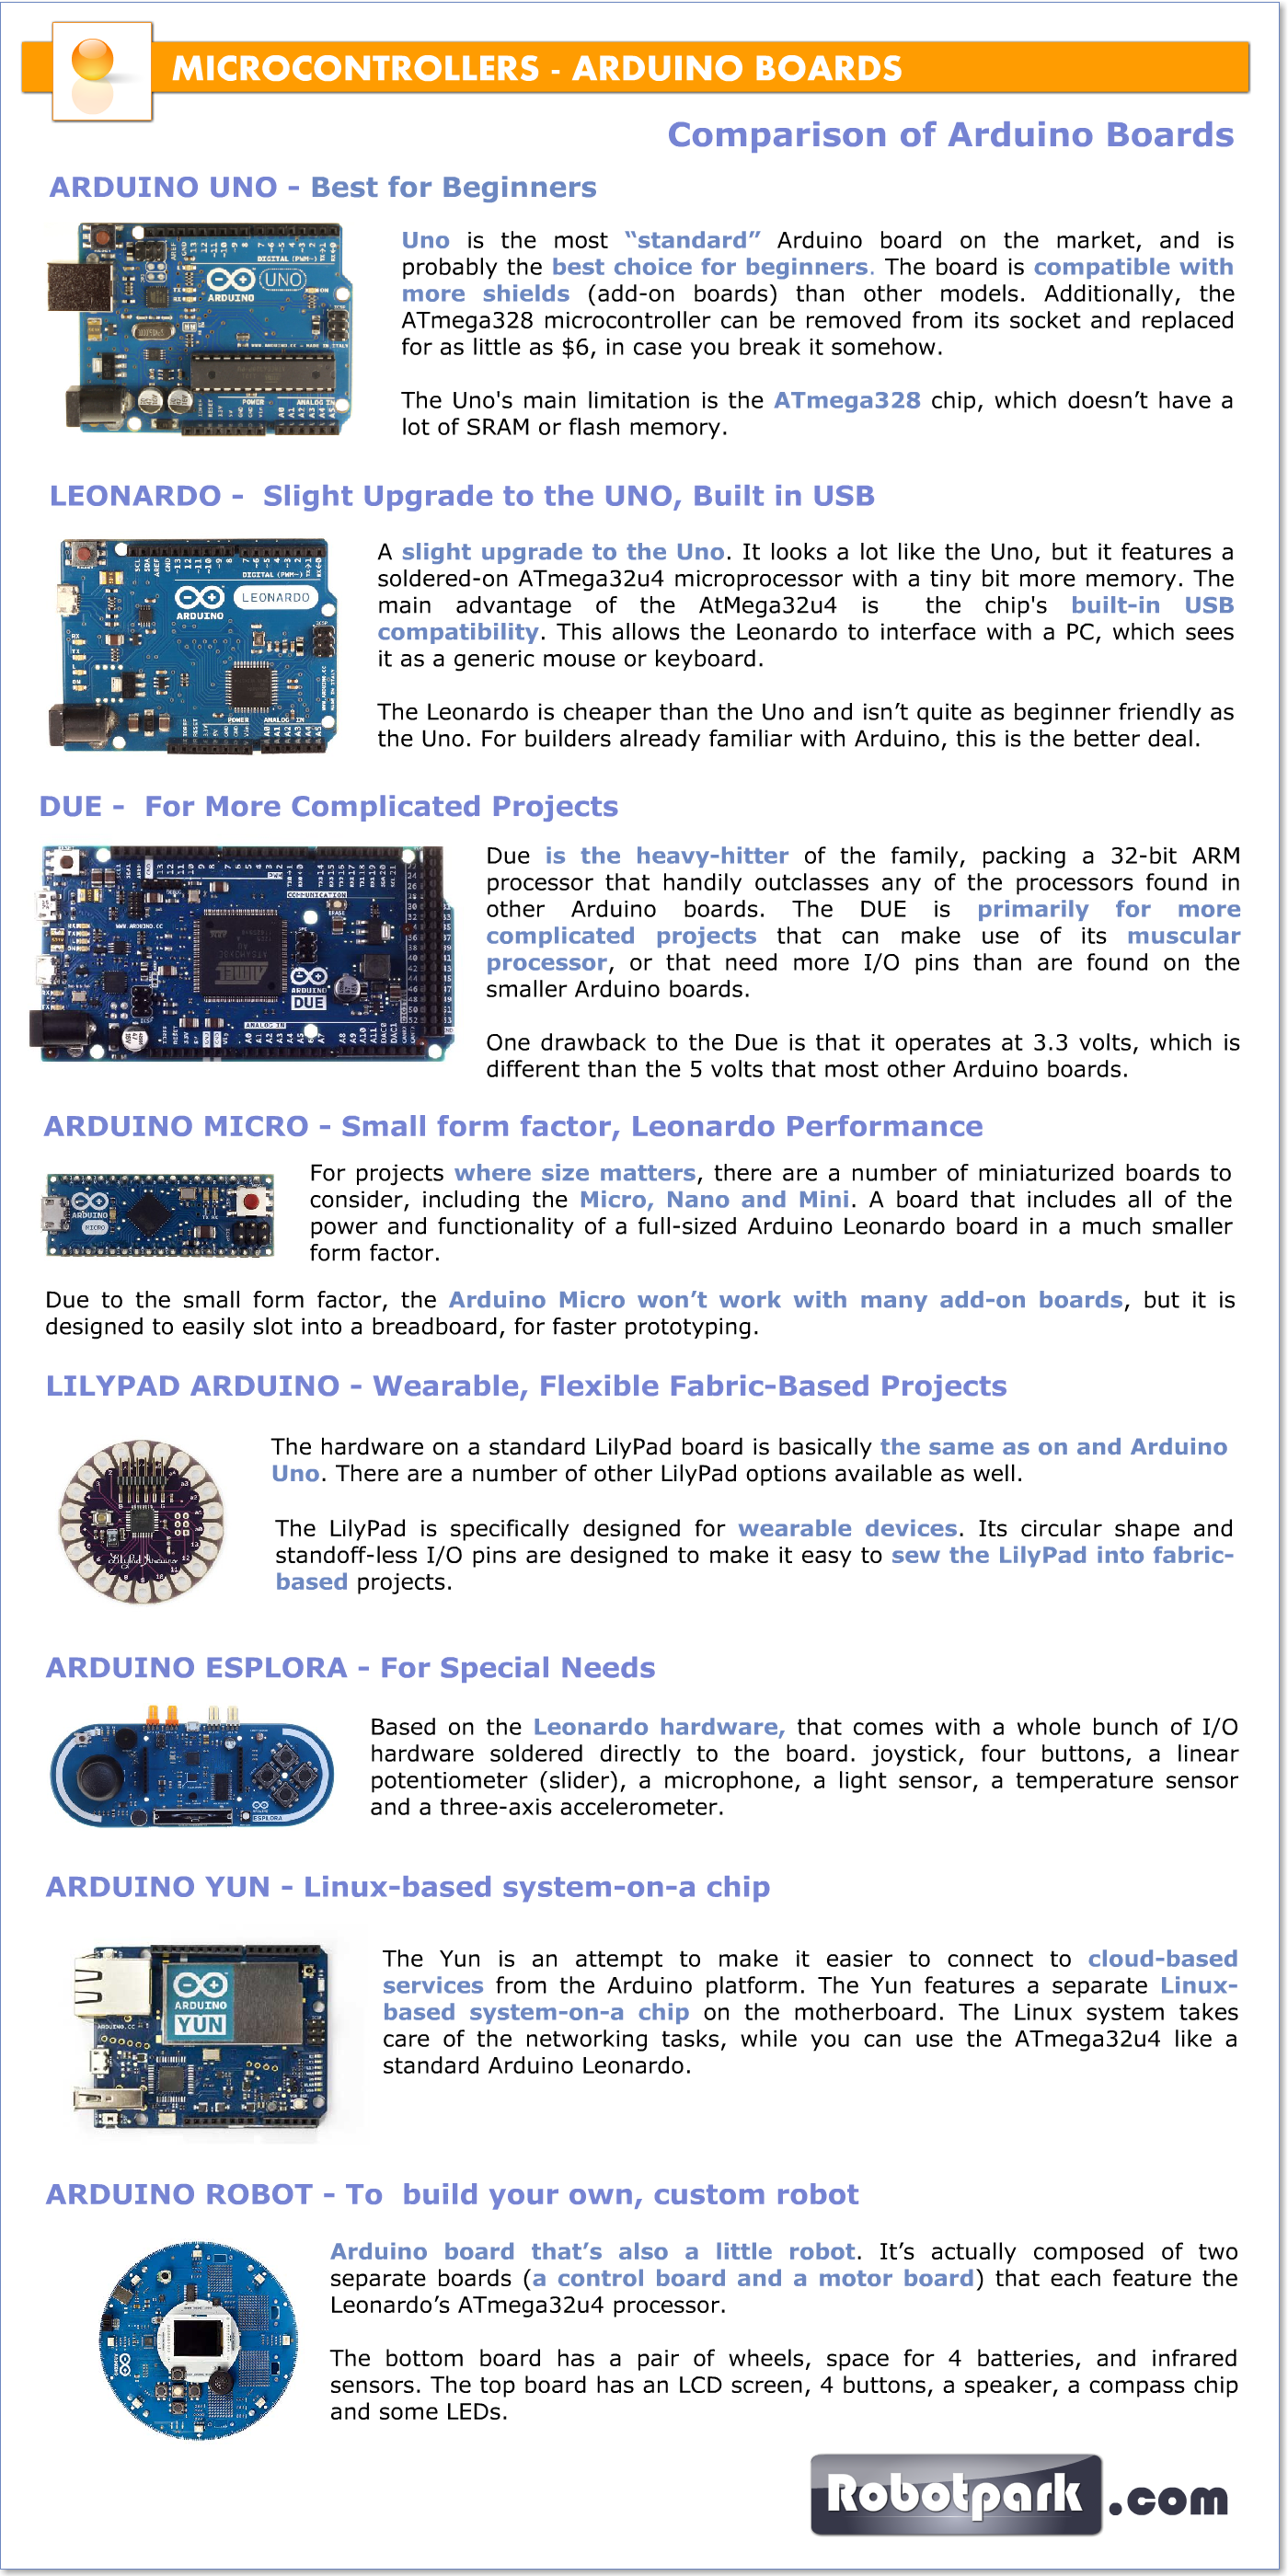 Comparison of arduino boards  robotpark academy